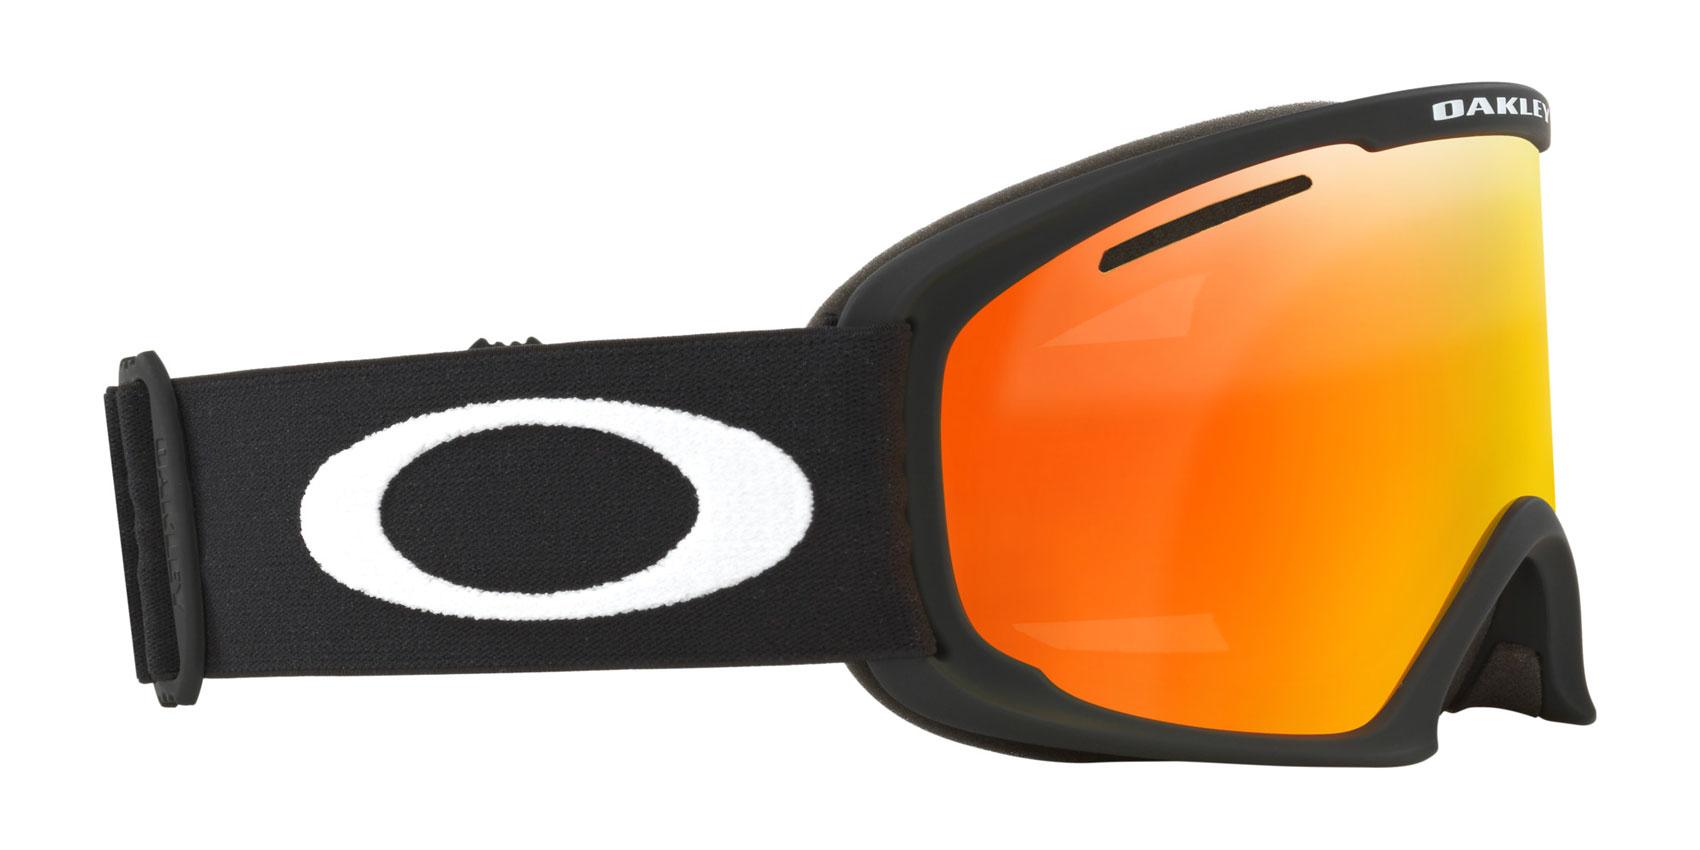 a8ef66ea5f Sentinel Oakley Snowboard Goggles - O Frame 2.0 XM - Matte Black Fire  Iridium